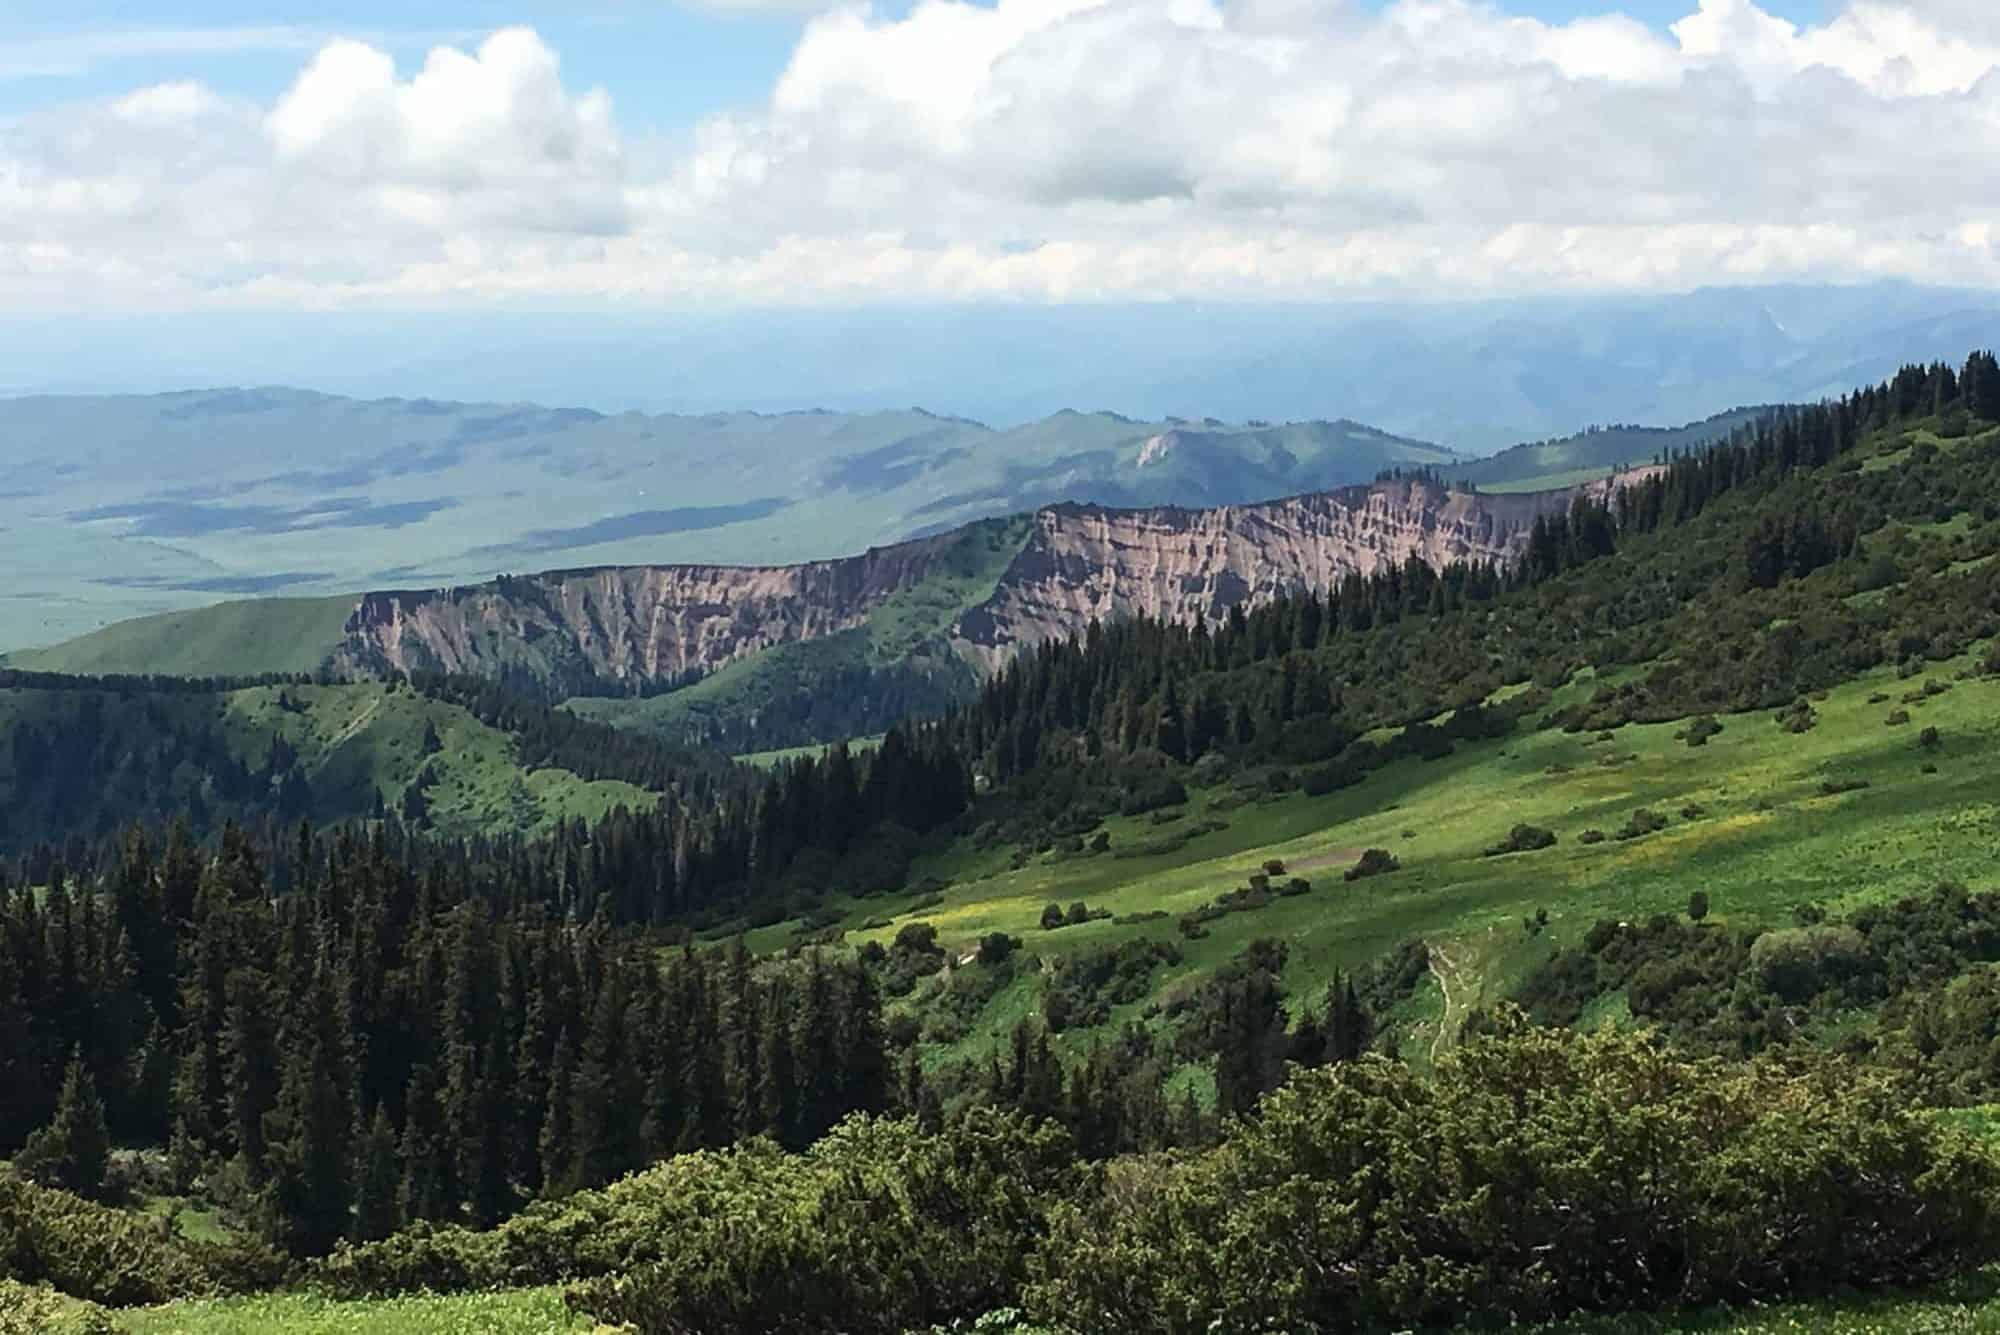 Kyzyl-Jar Canyon, Jyrgalan - Kyrgyzstan